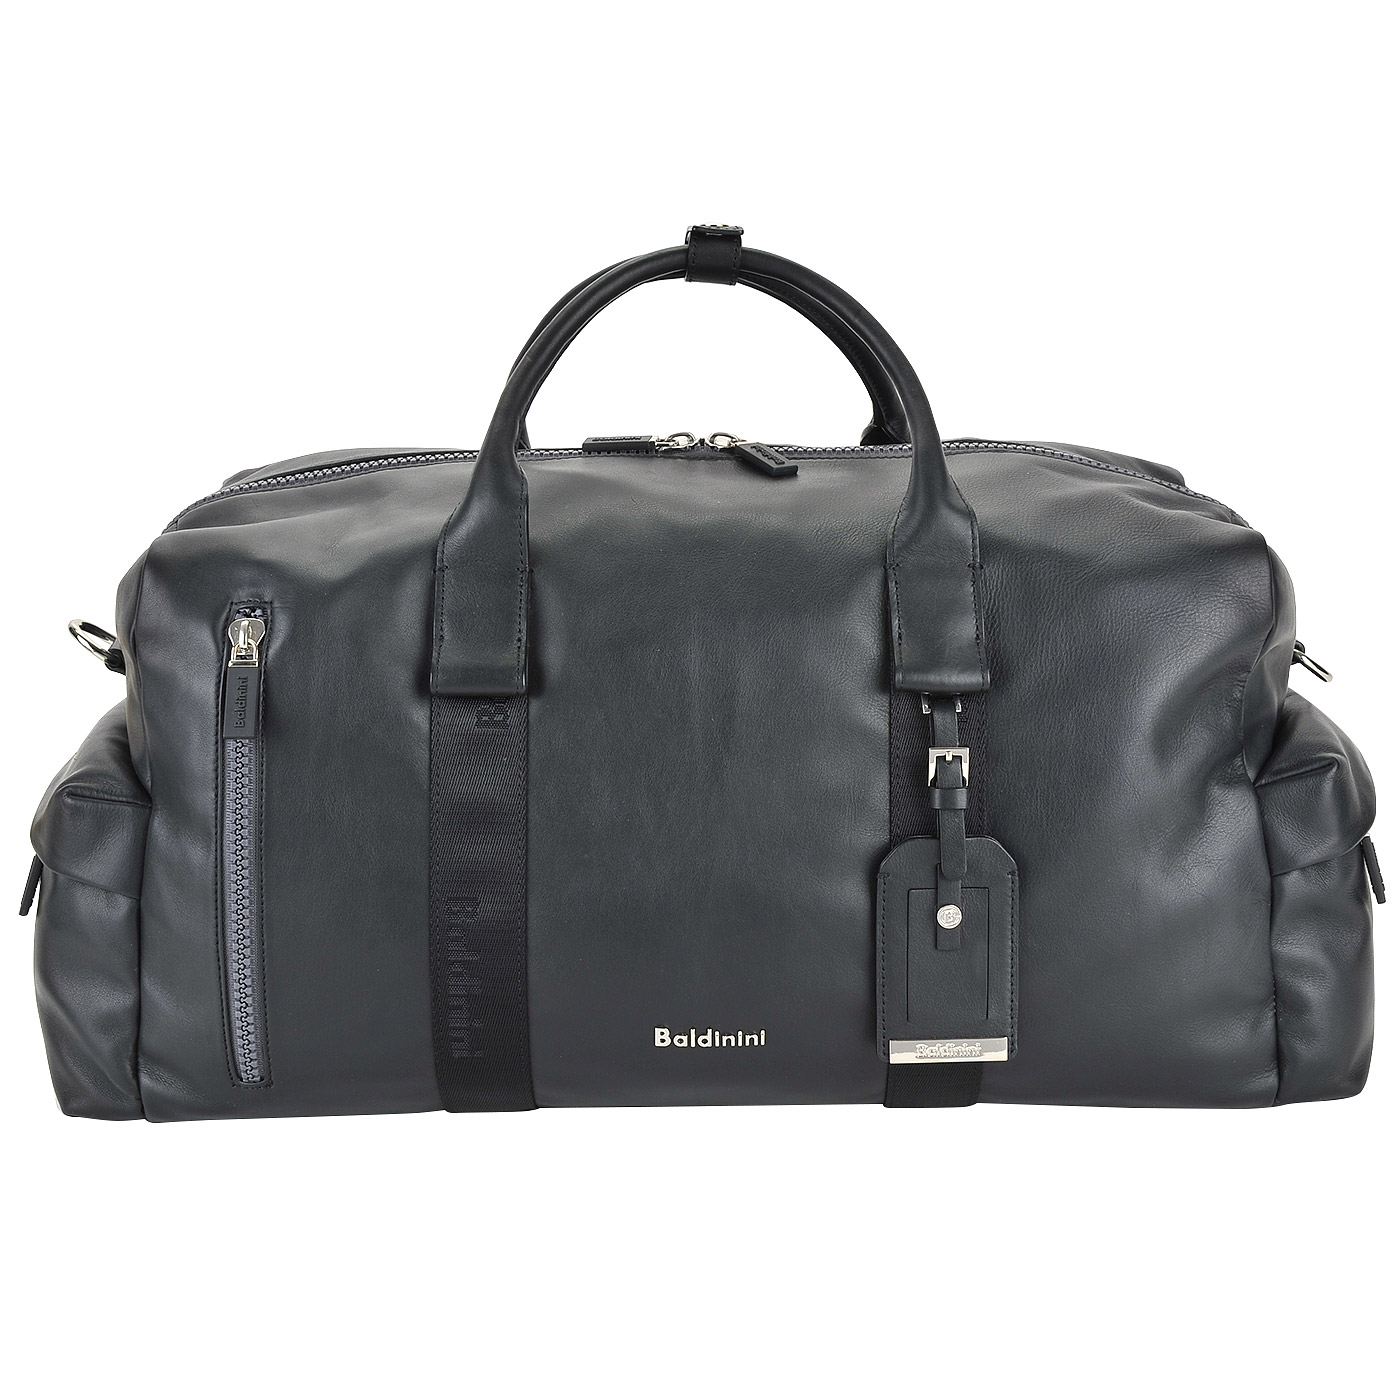 acc2bd194304 ... Мужская кожаная дорожная сумка со съемным плечевым ремешком Baldinini  Yuri ...